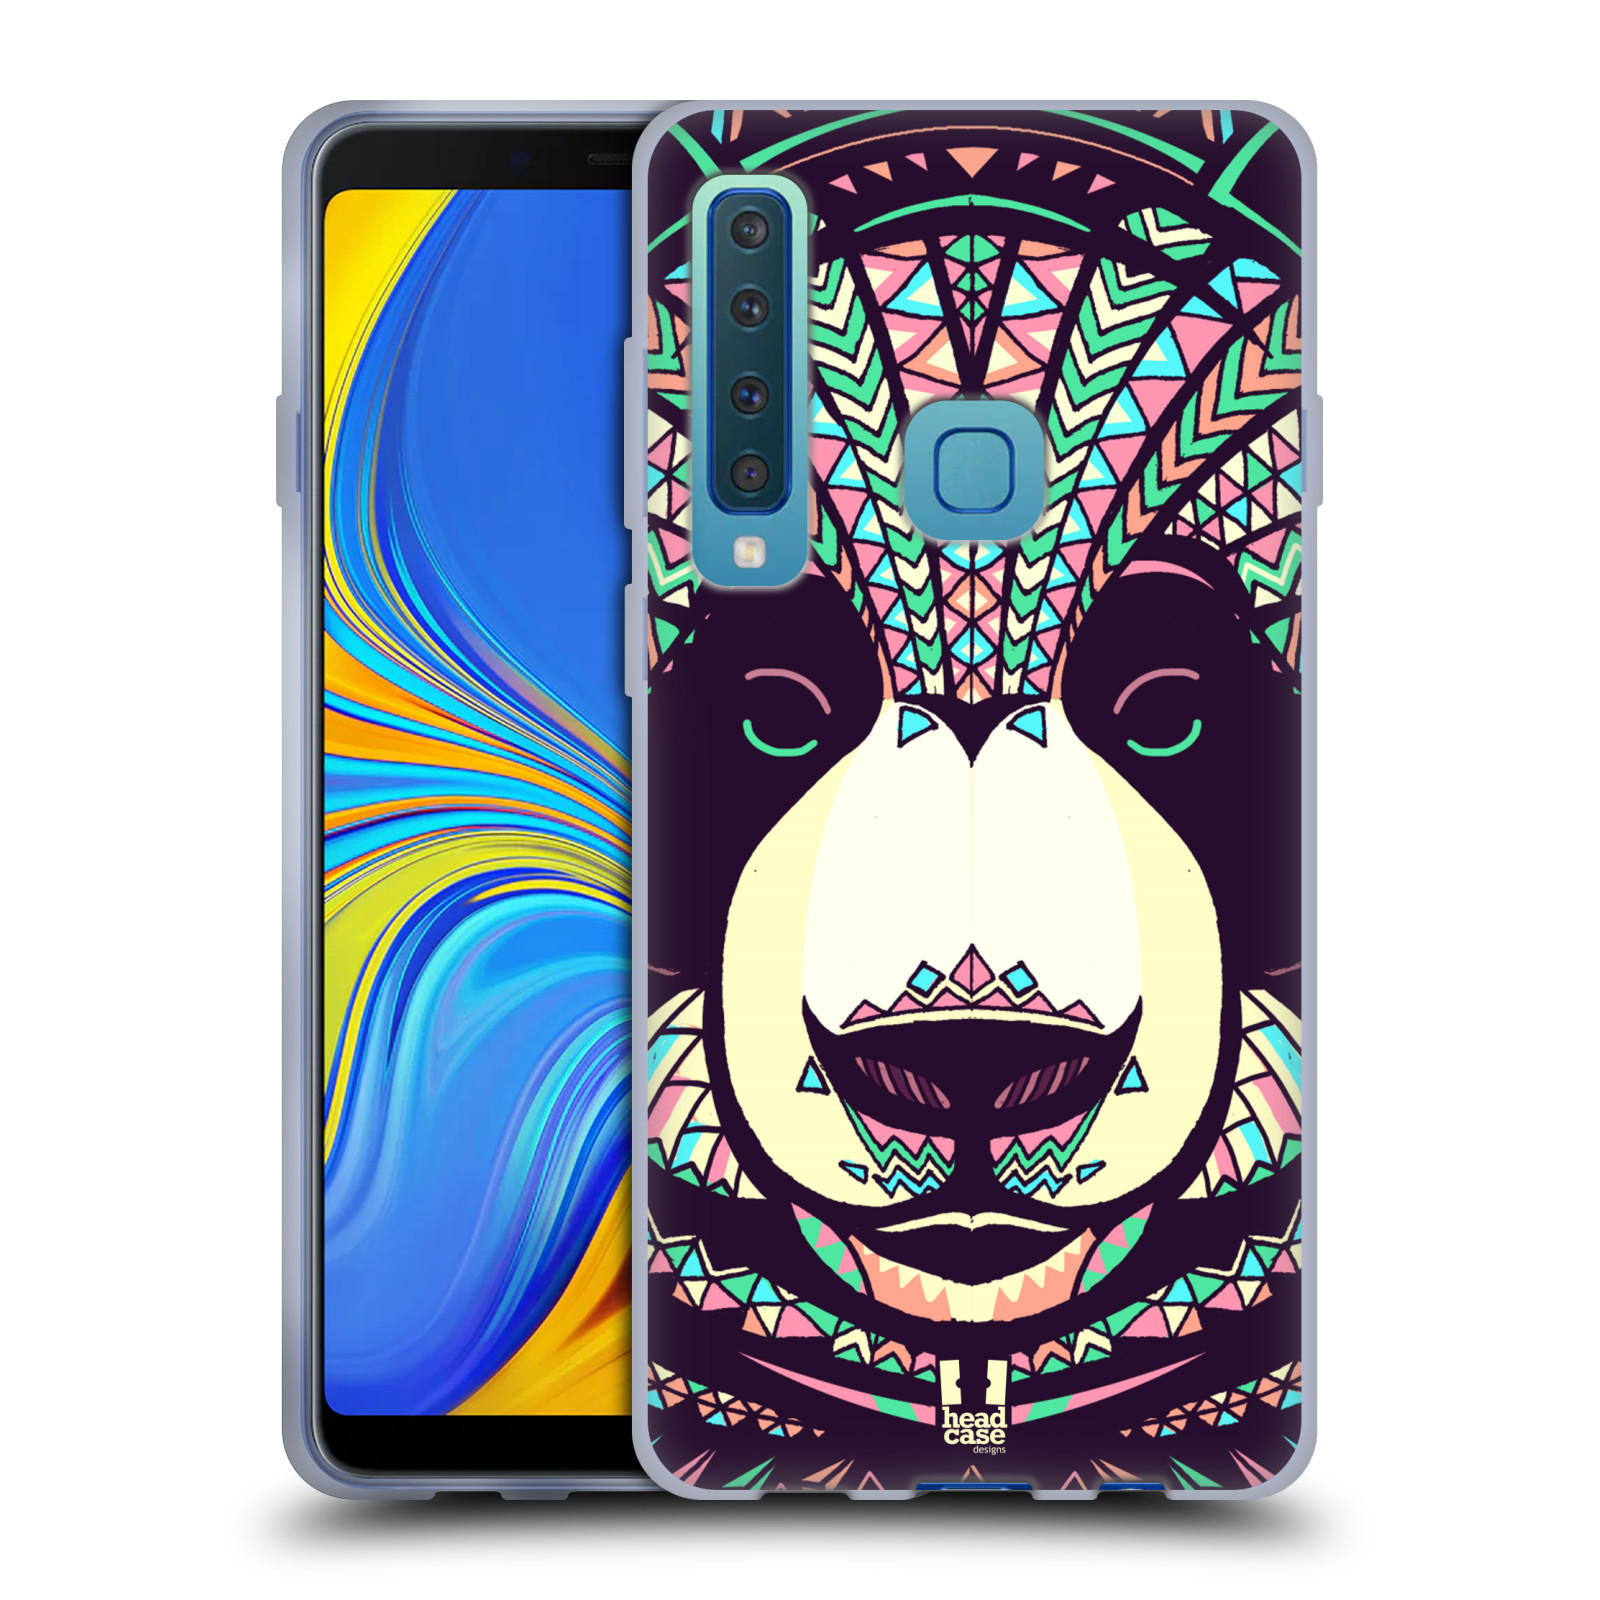 Silikonové pouzdro na mobil Samsung Galaxy A9 (2018) - Head Case - AZTEC PANDA